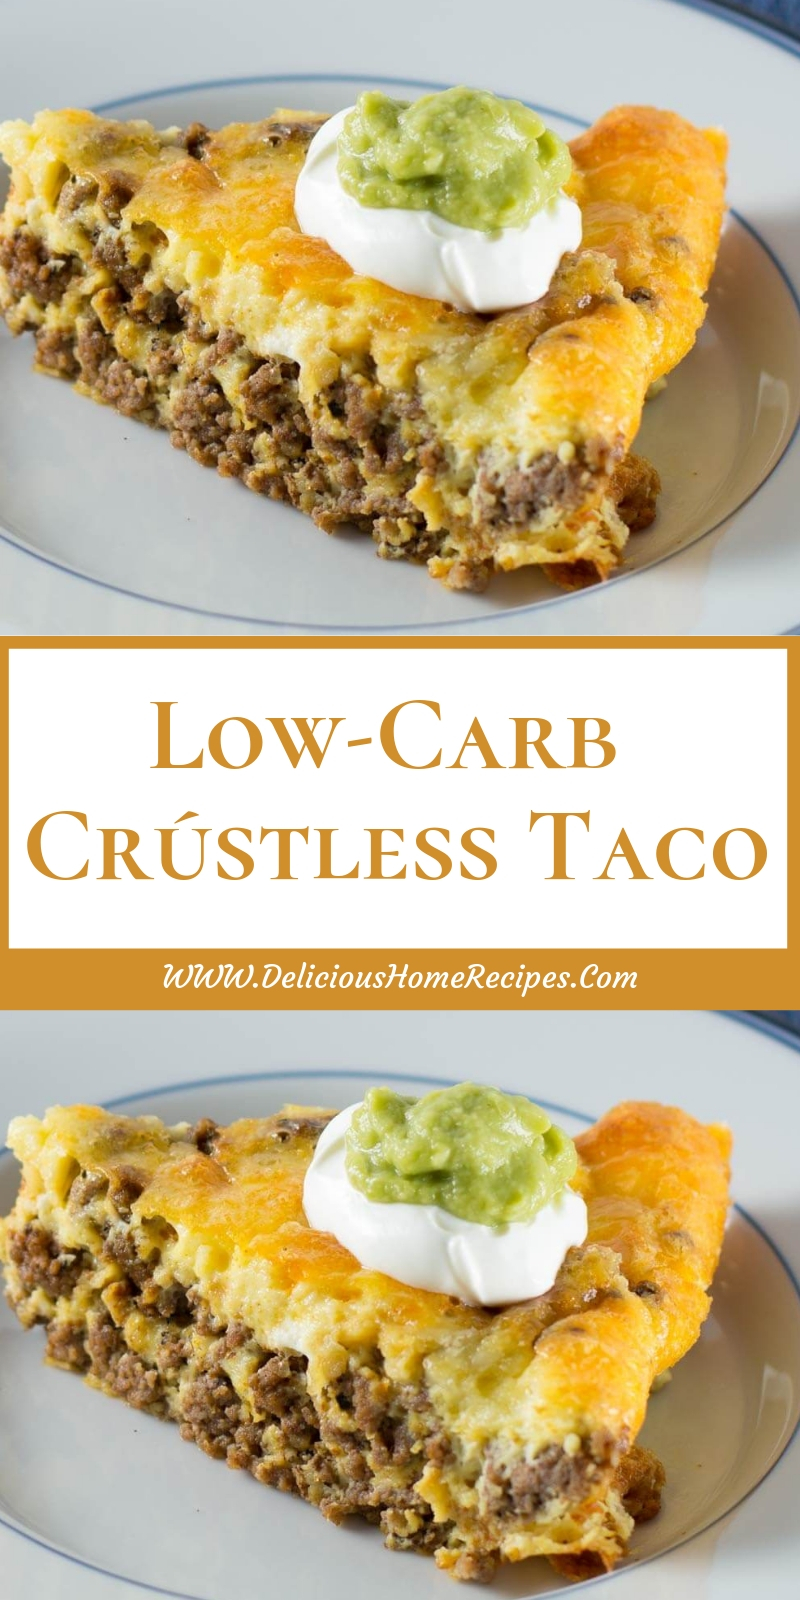 Low-Carb Crústless Taco